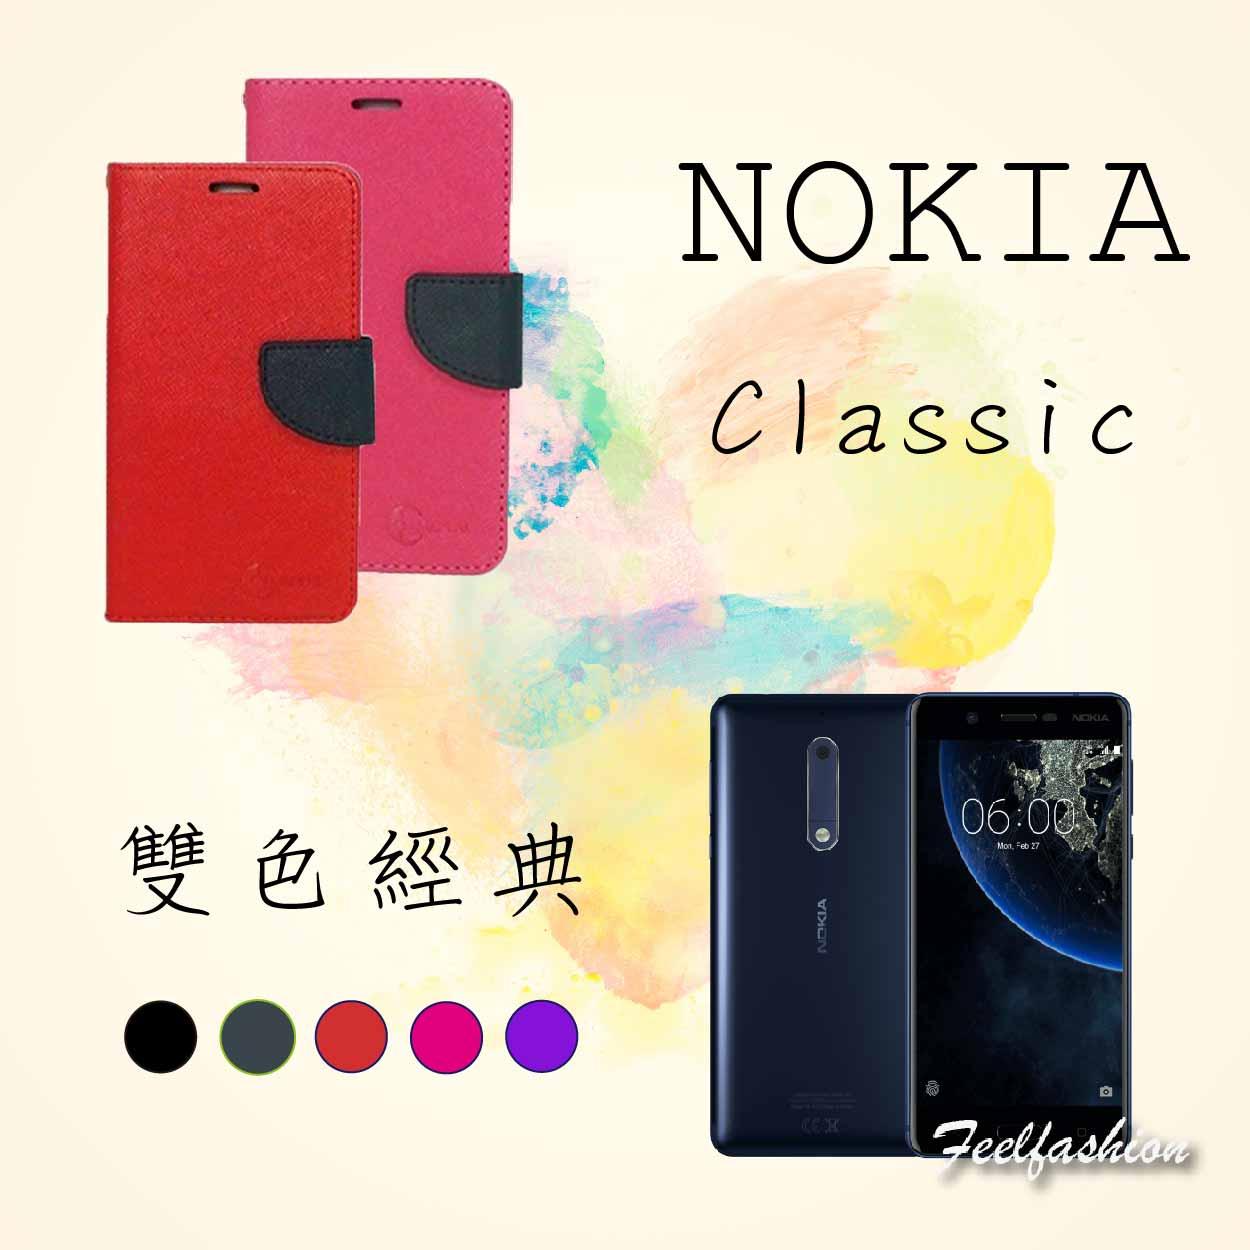 NOKIA 6 / NOKIA 8 / NOKIA 6.1 Plus(X6) 經典款 側掀可立 保護皮套 殼 書本式 手機支架